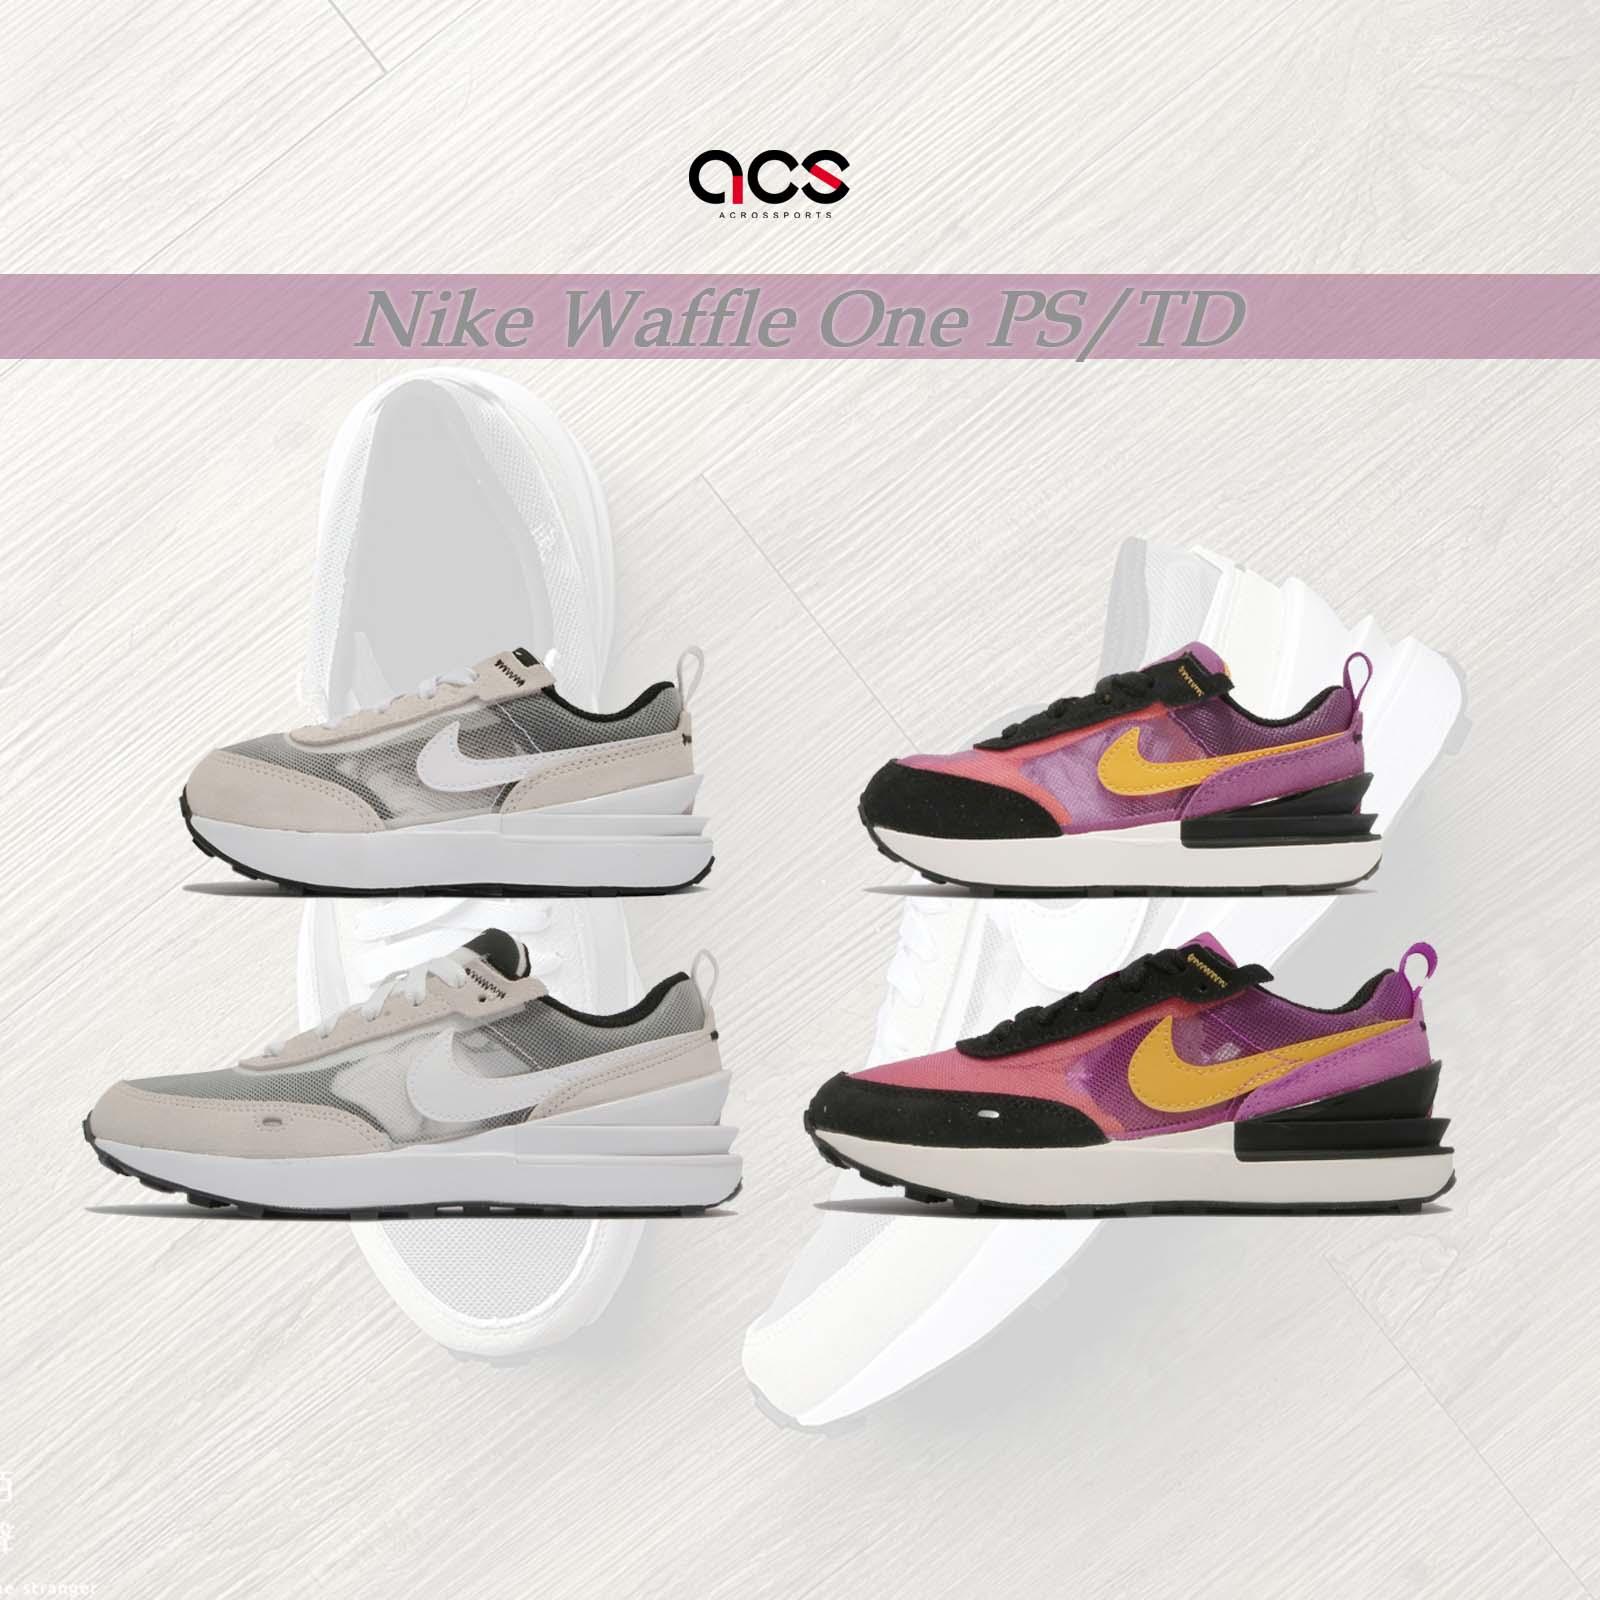 Nike 童鞋 Waffle One PS / TD 中小童鞋 小朋友 親子鞋 灰白 紫黃 小SACAI 任選【ACS】